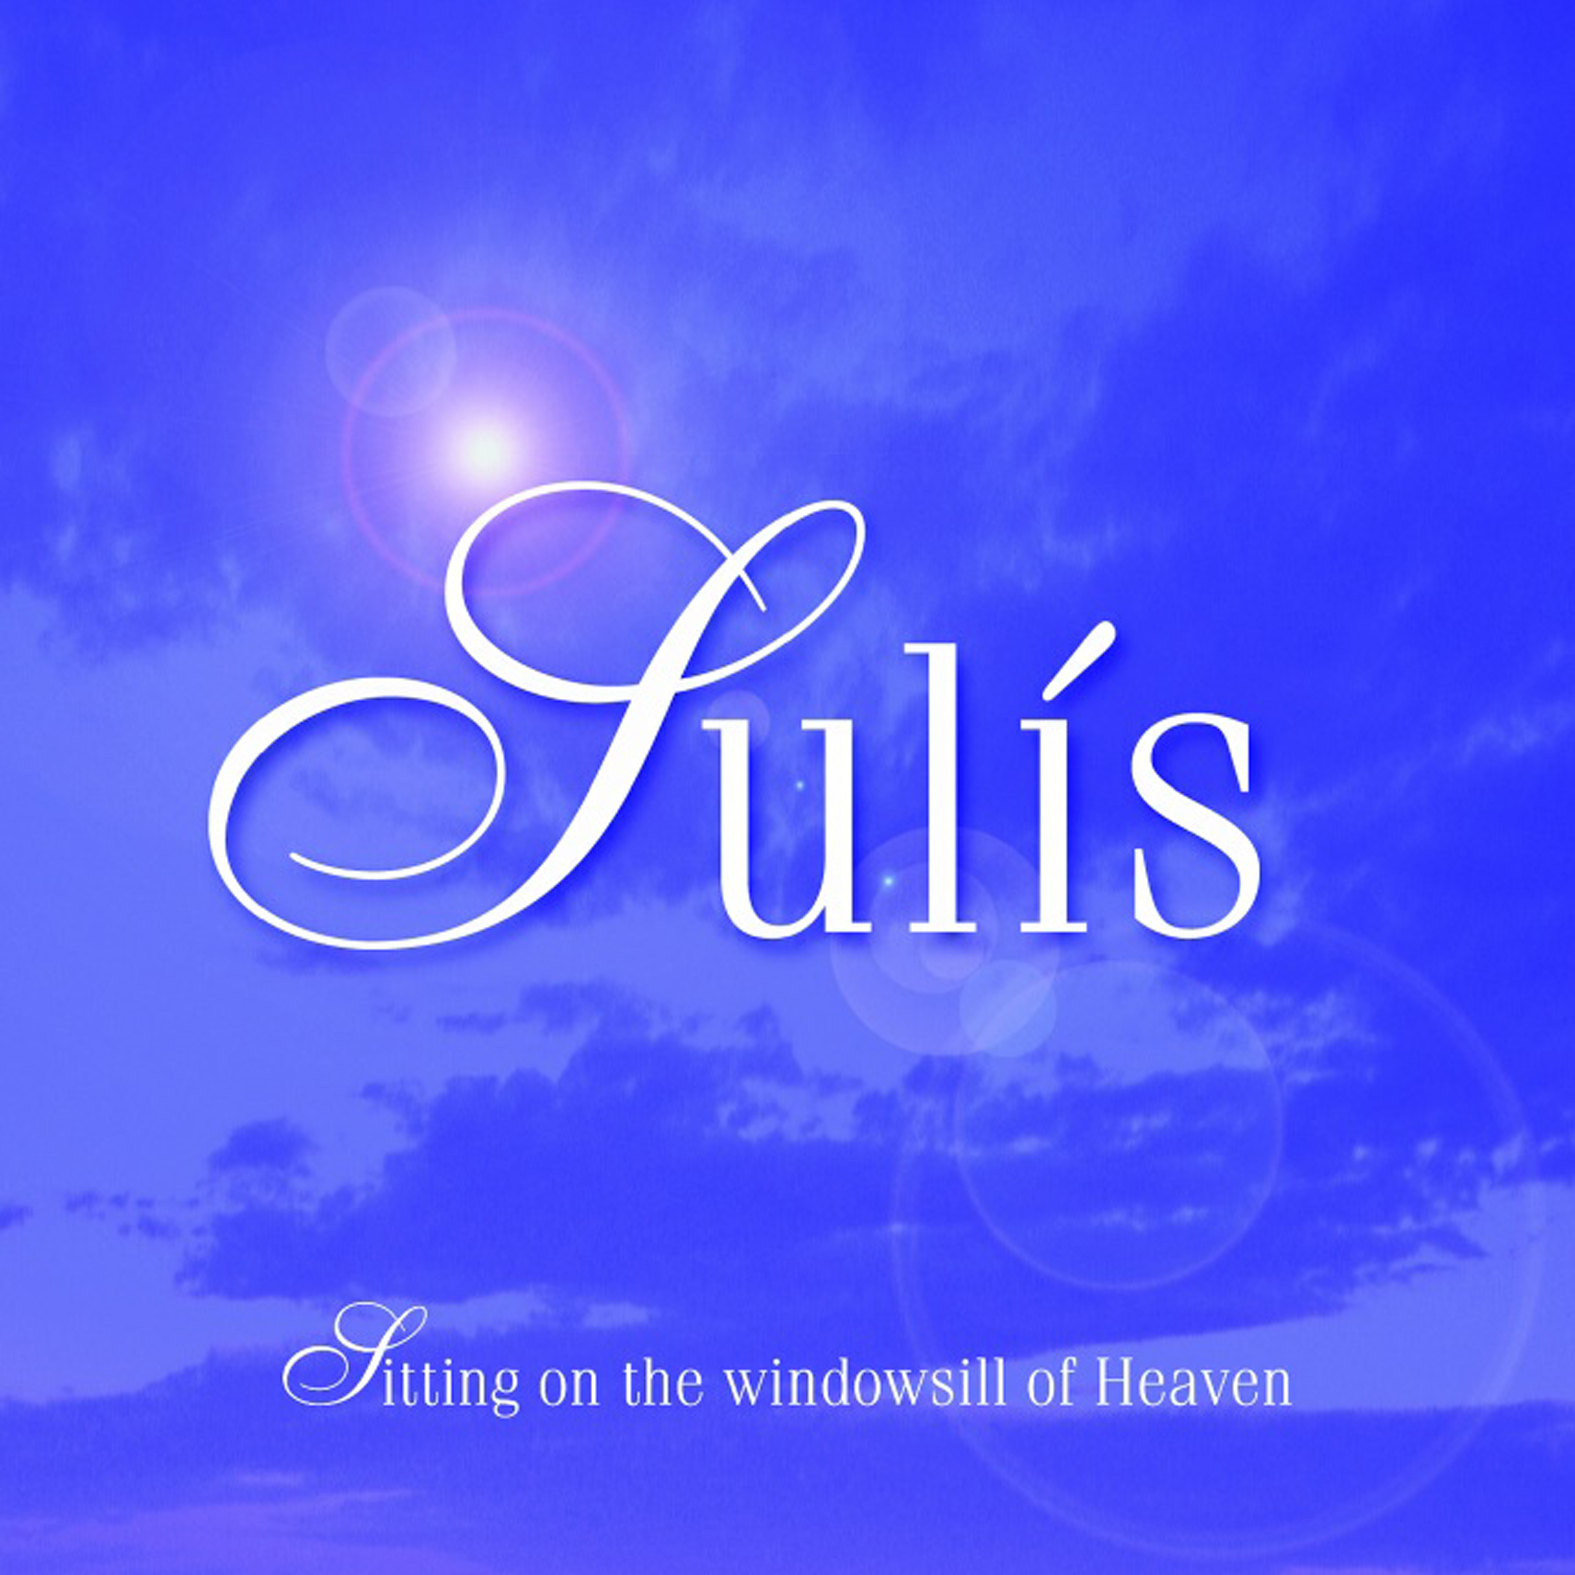 Sulis Images